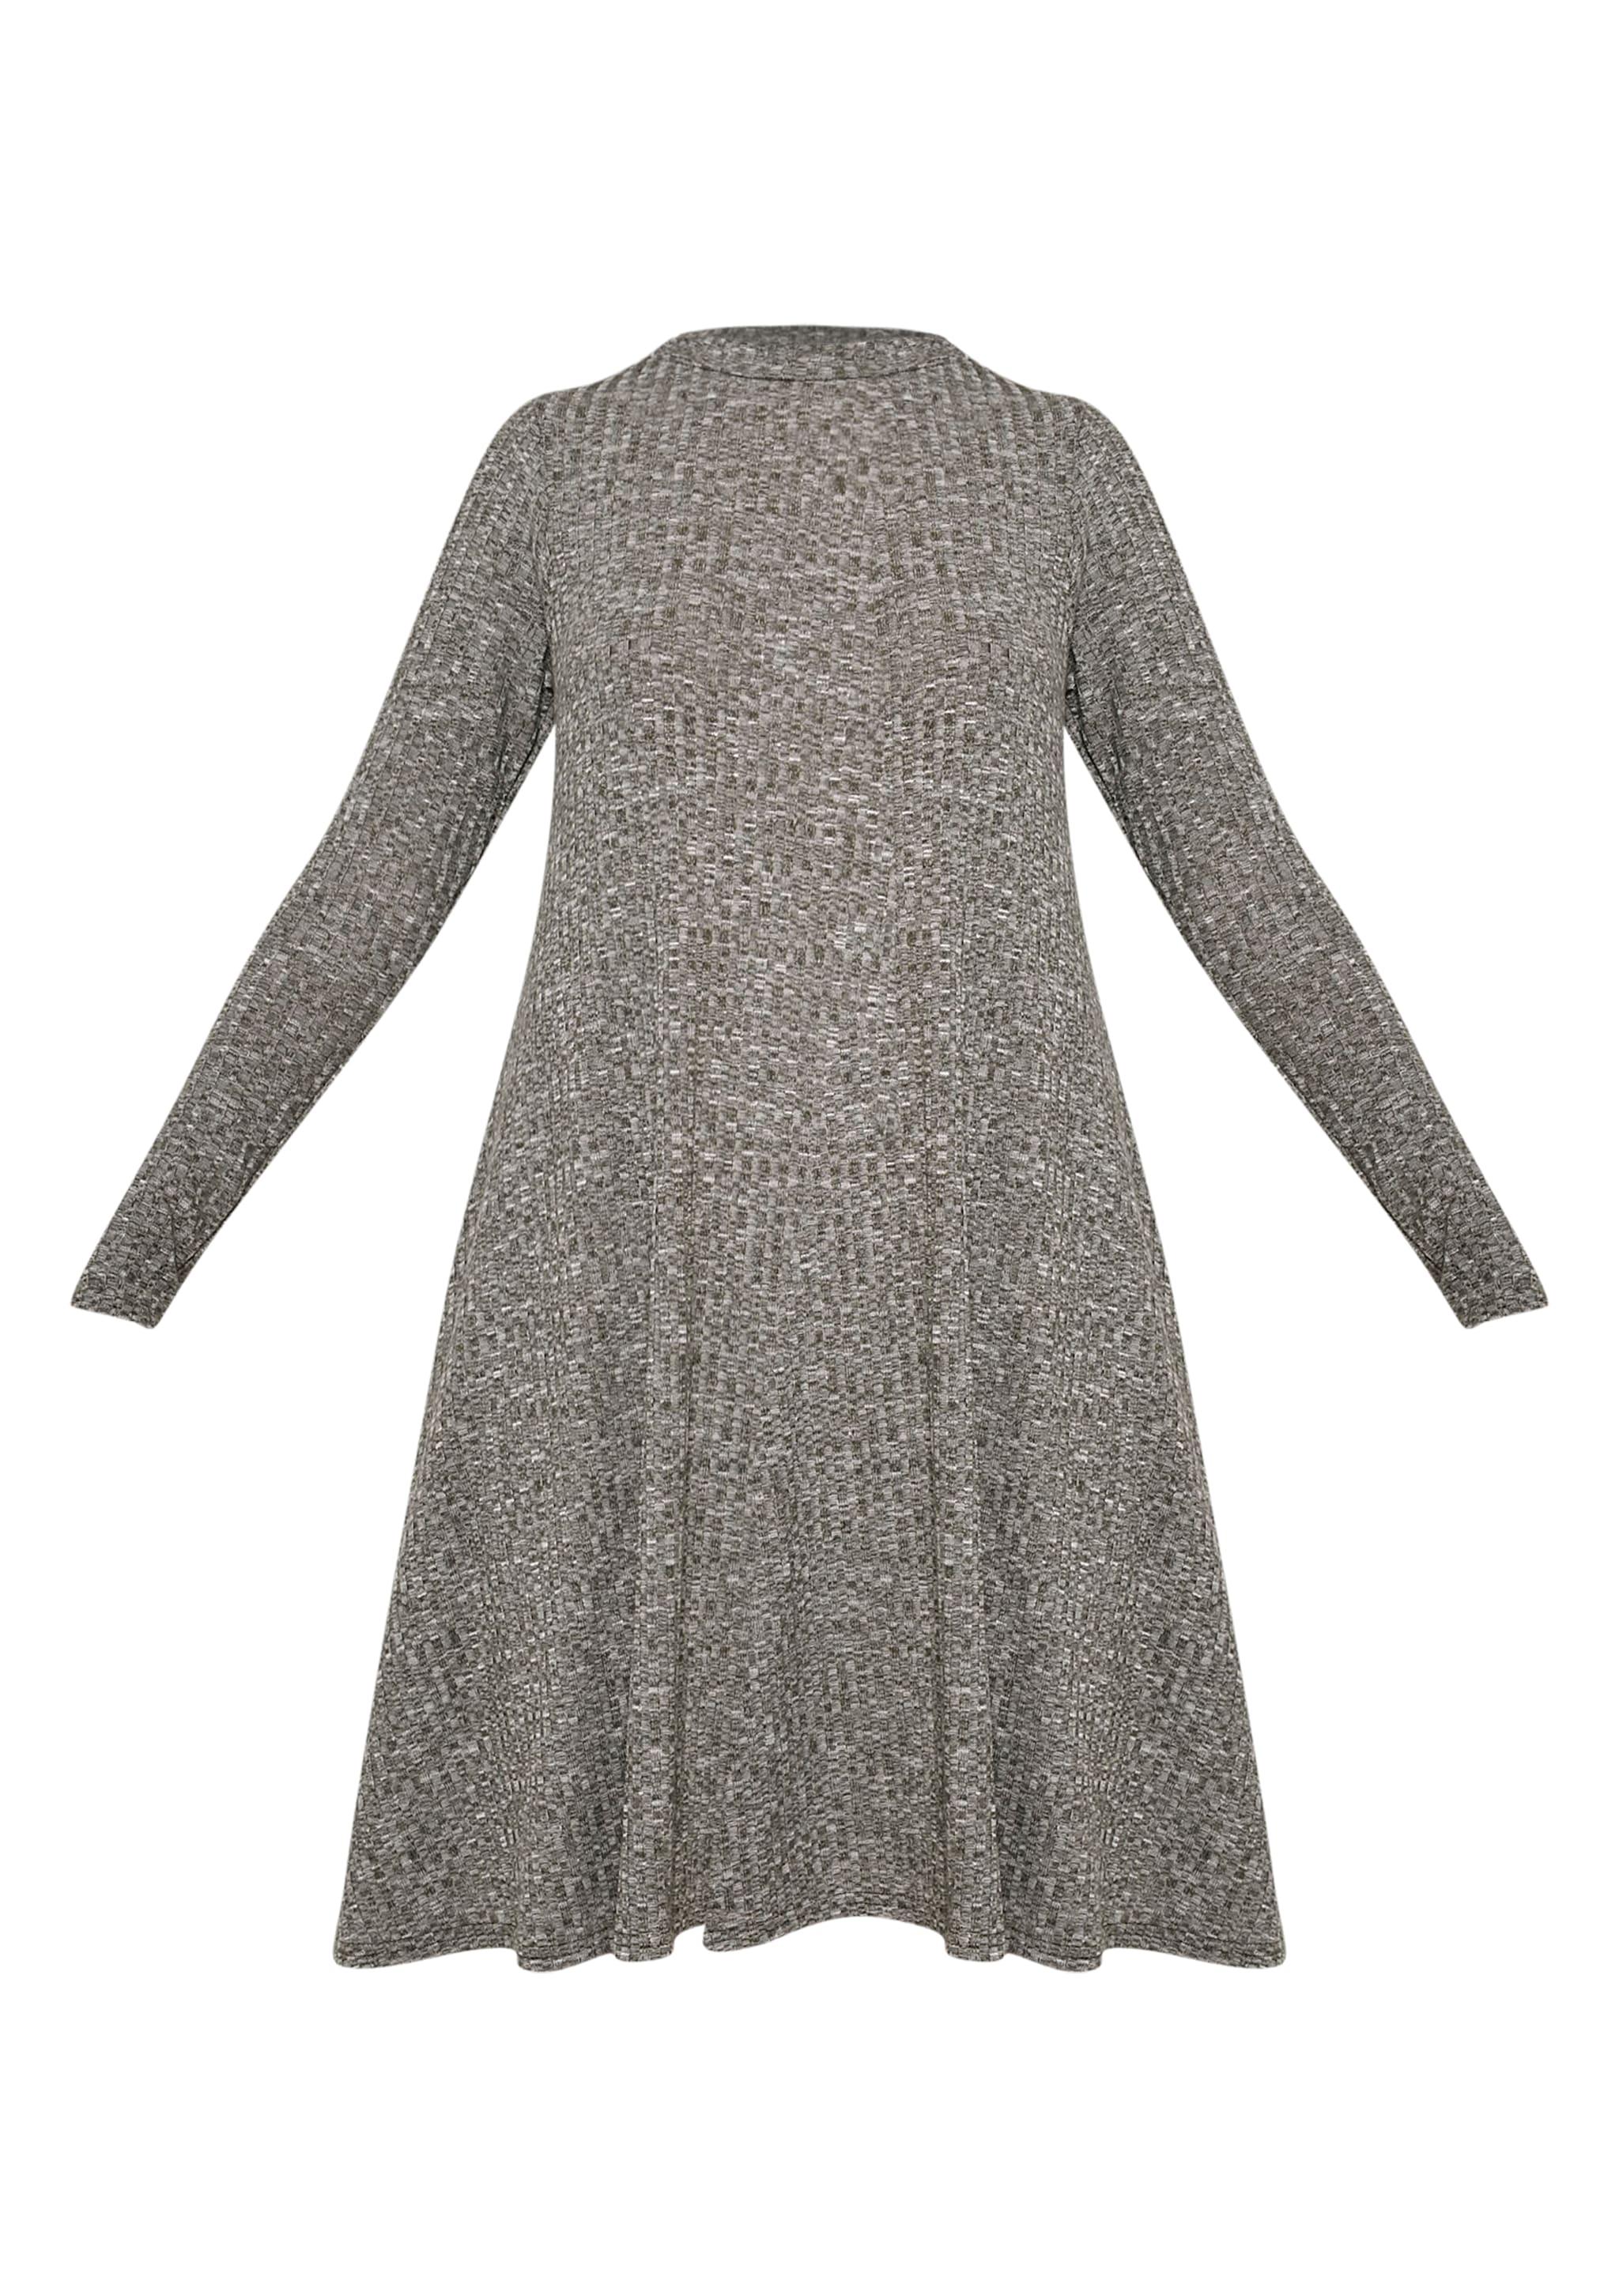 Renae Khaki High Neck Swing Dress 3